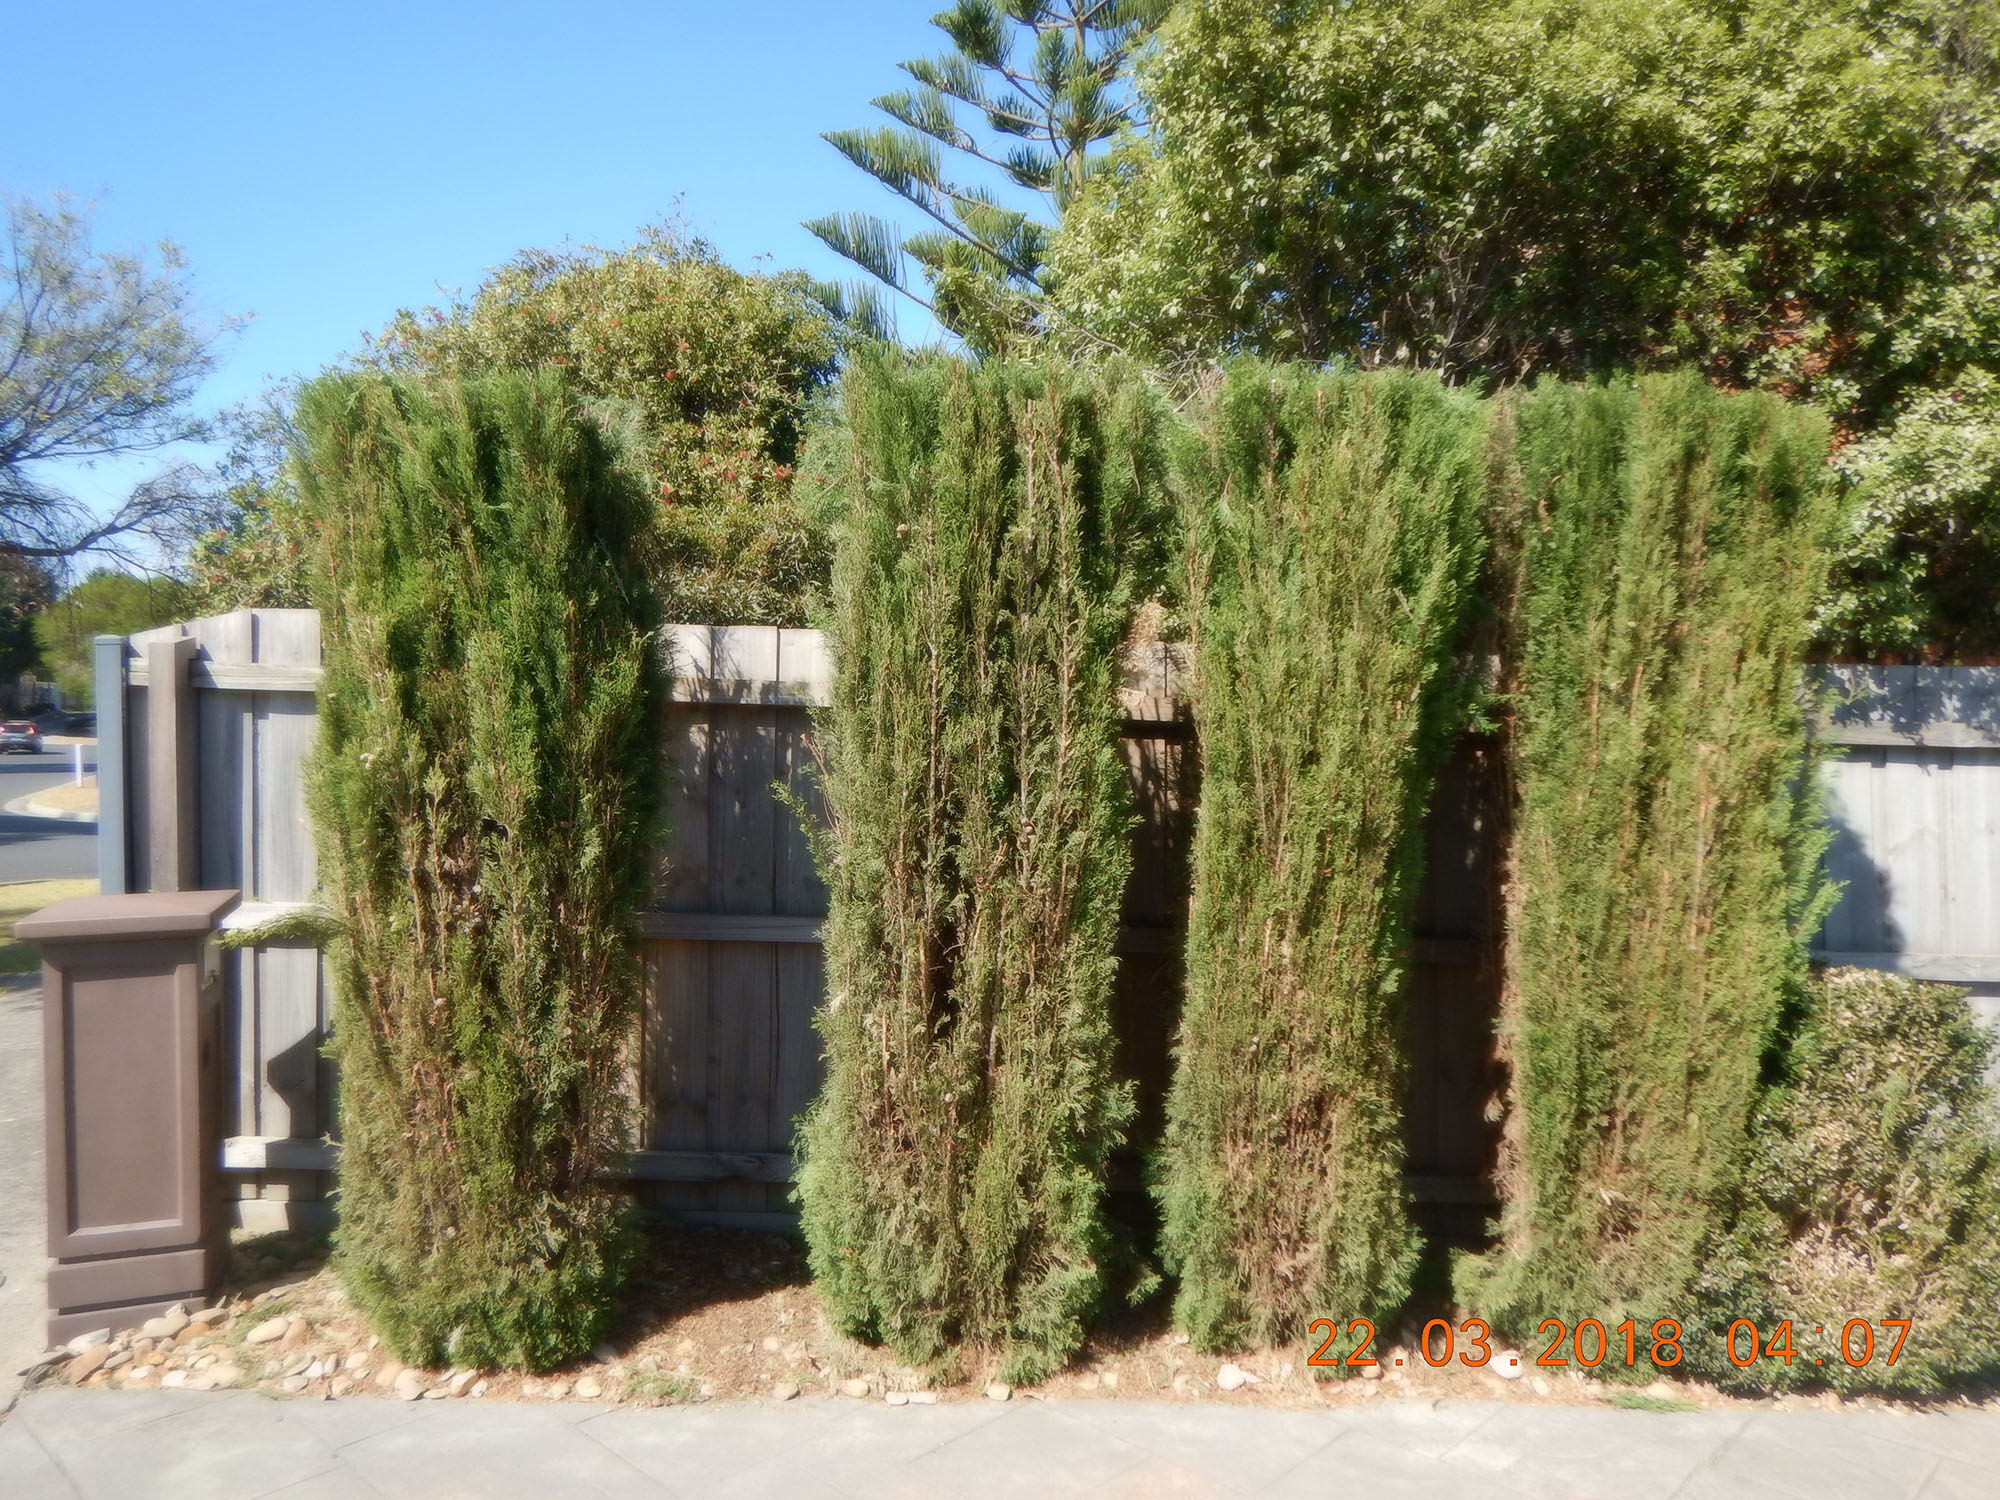 Landscaping and gardening maintenance